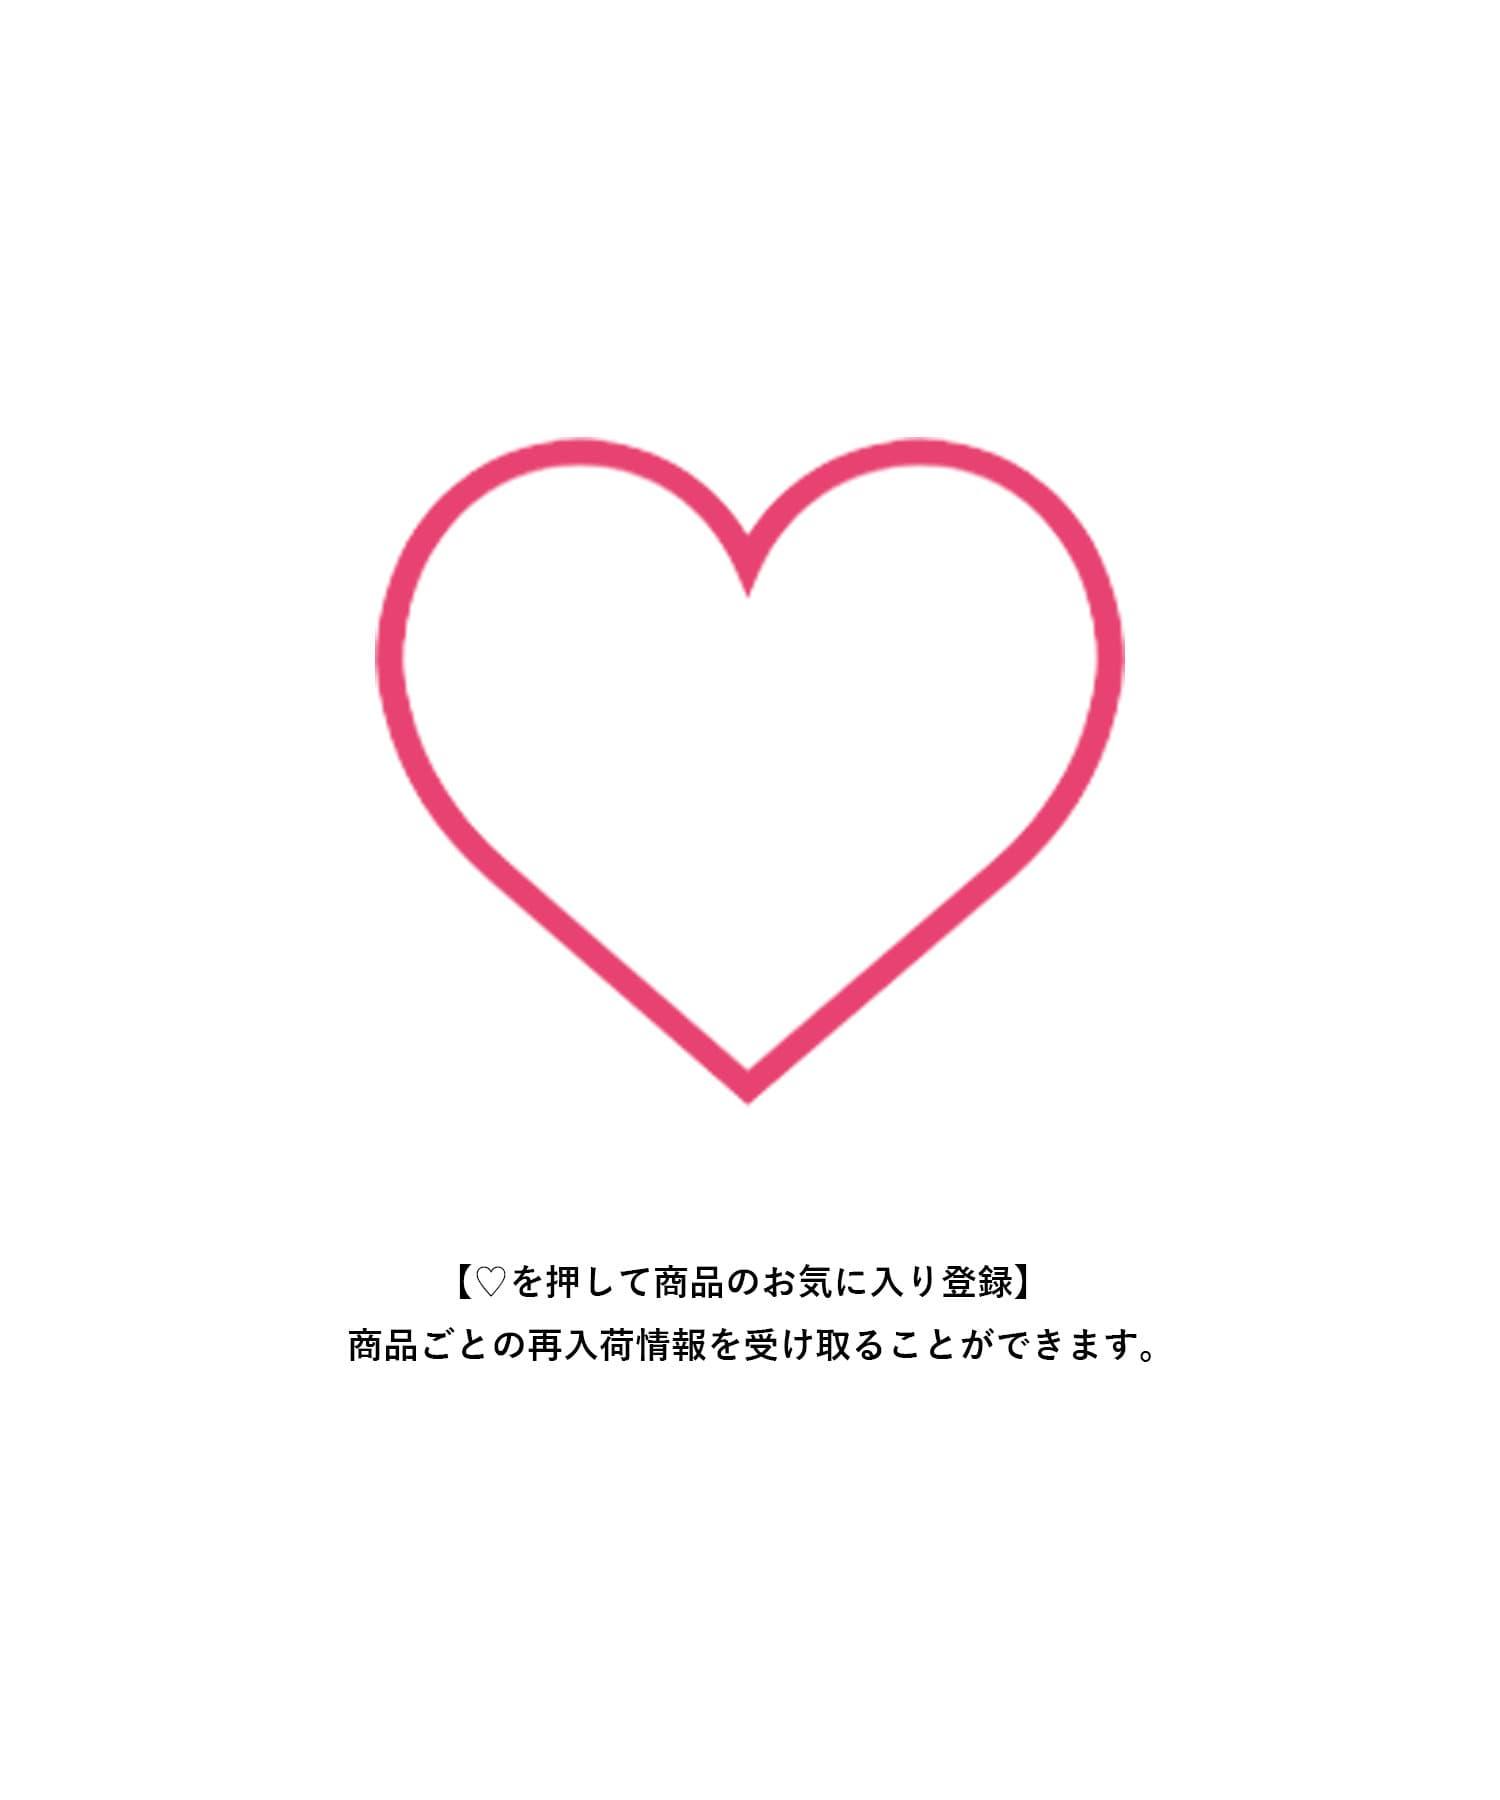 COLLAGE GALLARDAGALANTE(コラージュ ガリャルダガランテ) 【PAPILLONNER/パピヨネ】2WAYレザーリュック